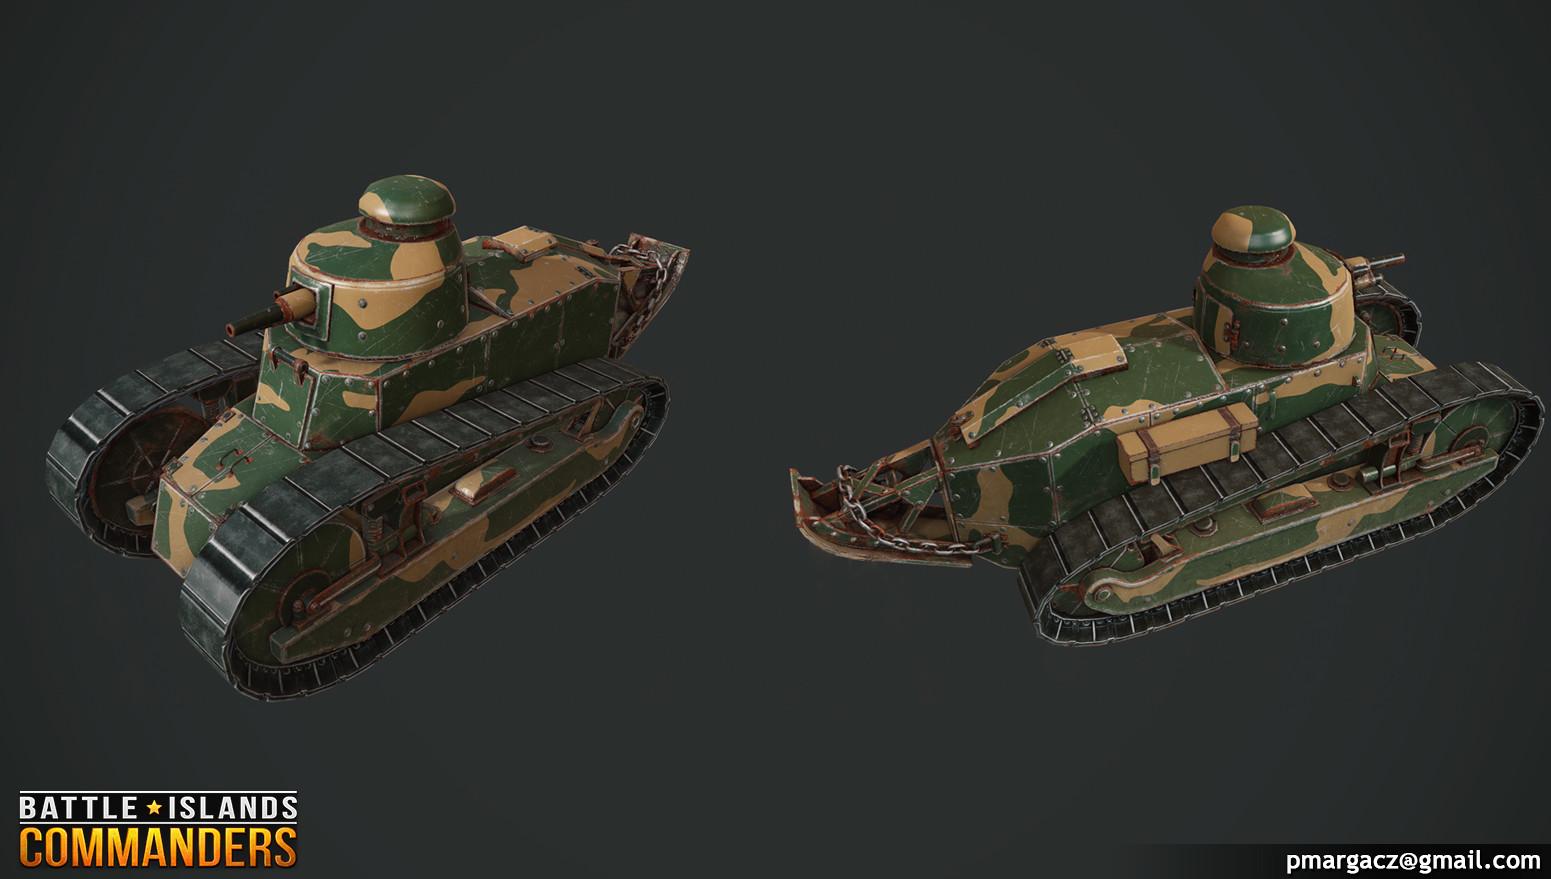 Pawel margacz lighttank2